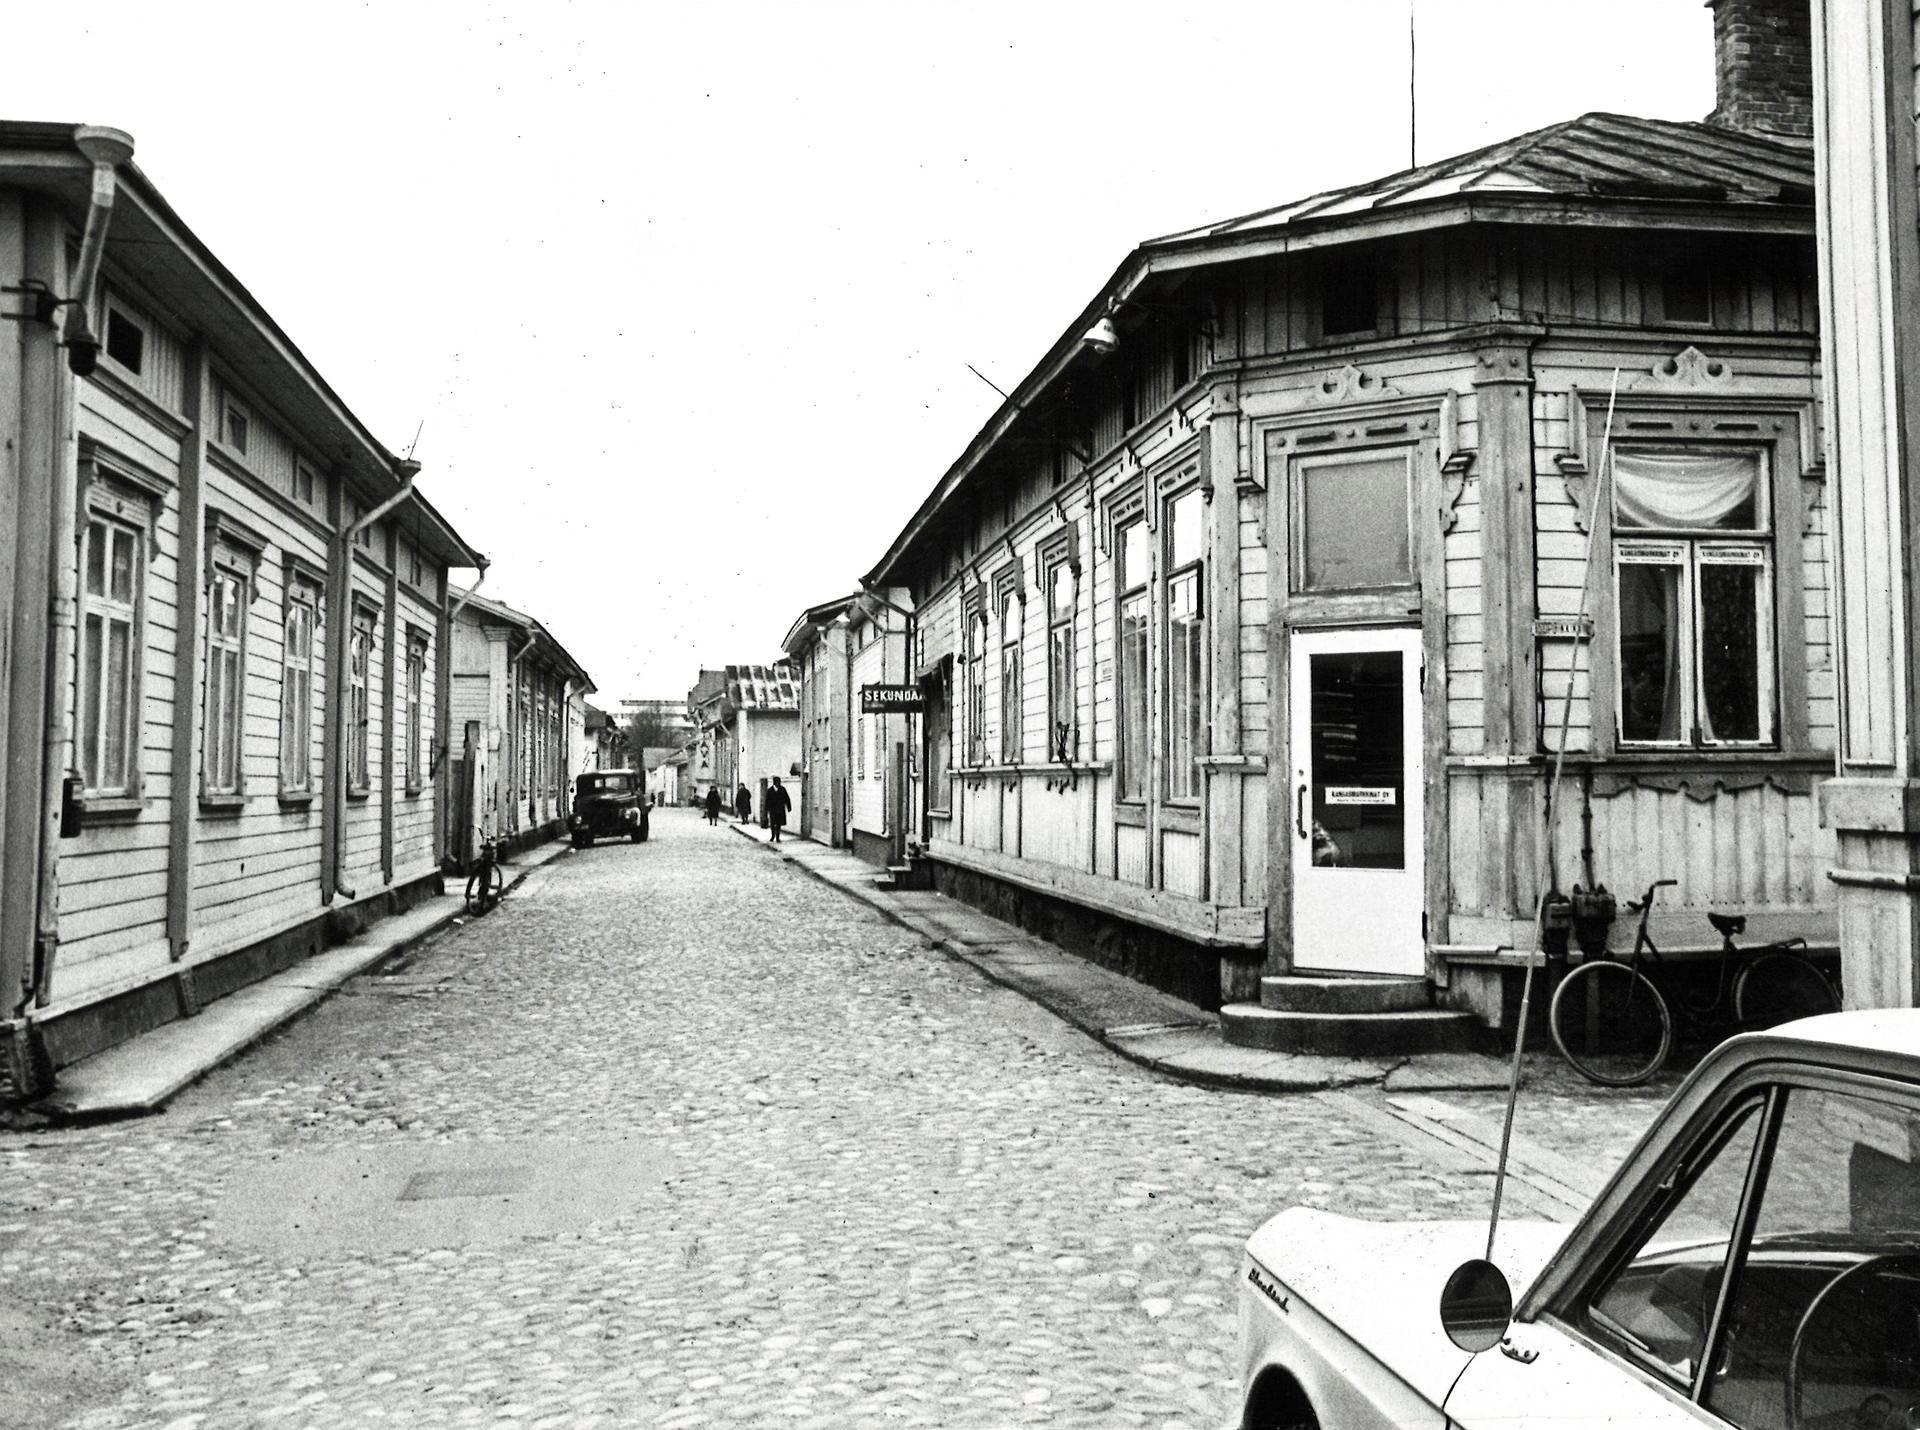 File:Rauma-1966.jpg - Wikimedia Commons